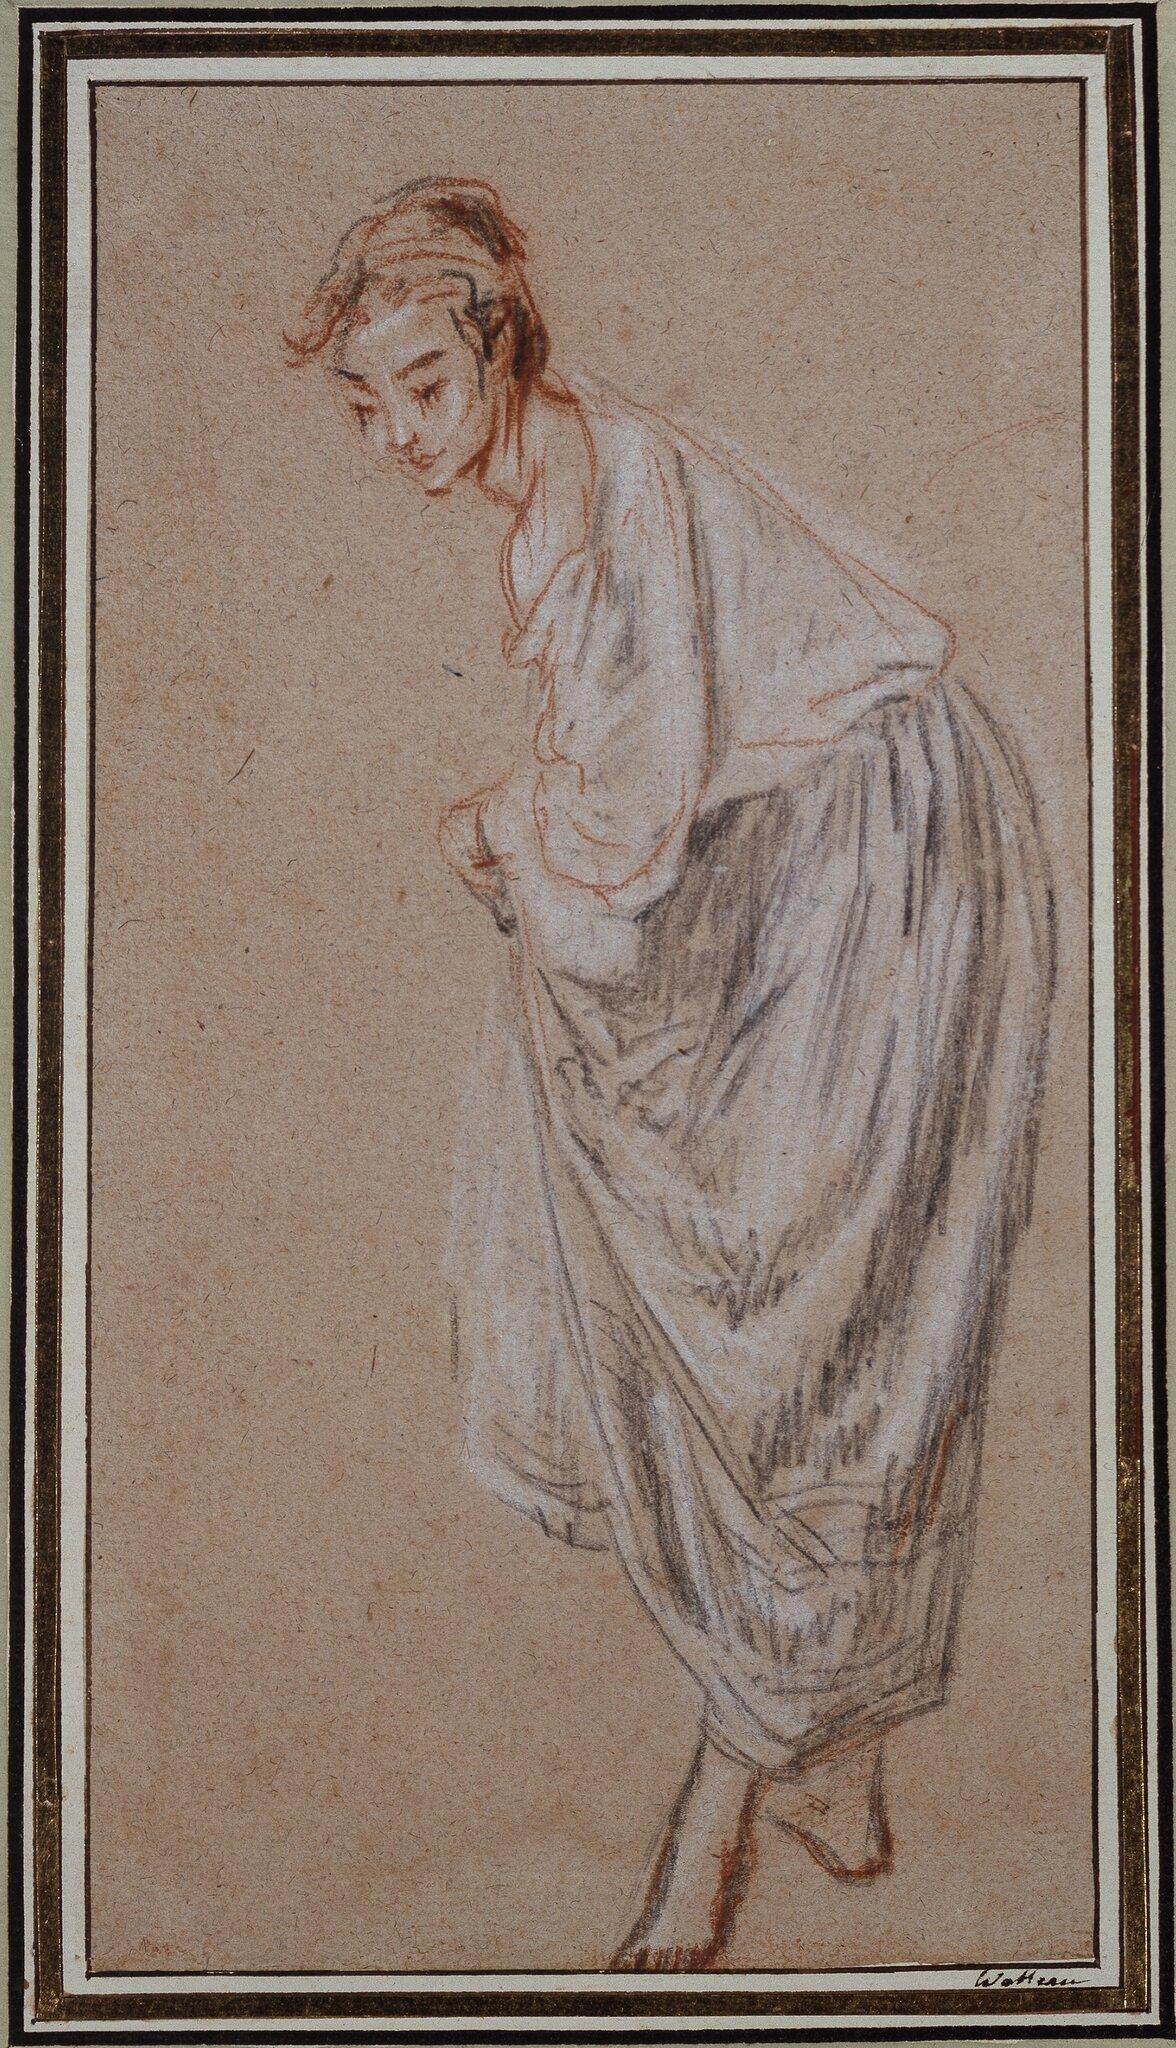 Städel Museum opens comprehensive exhibition of works by Antoine Watteau